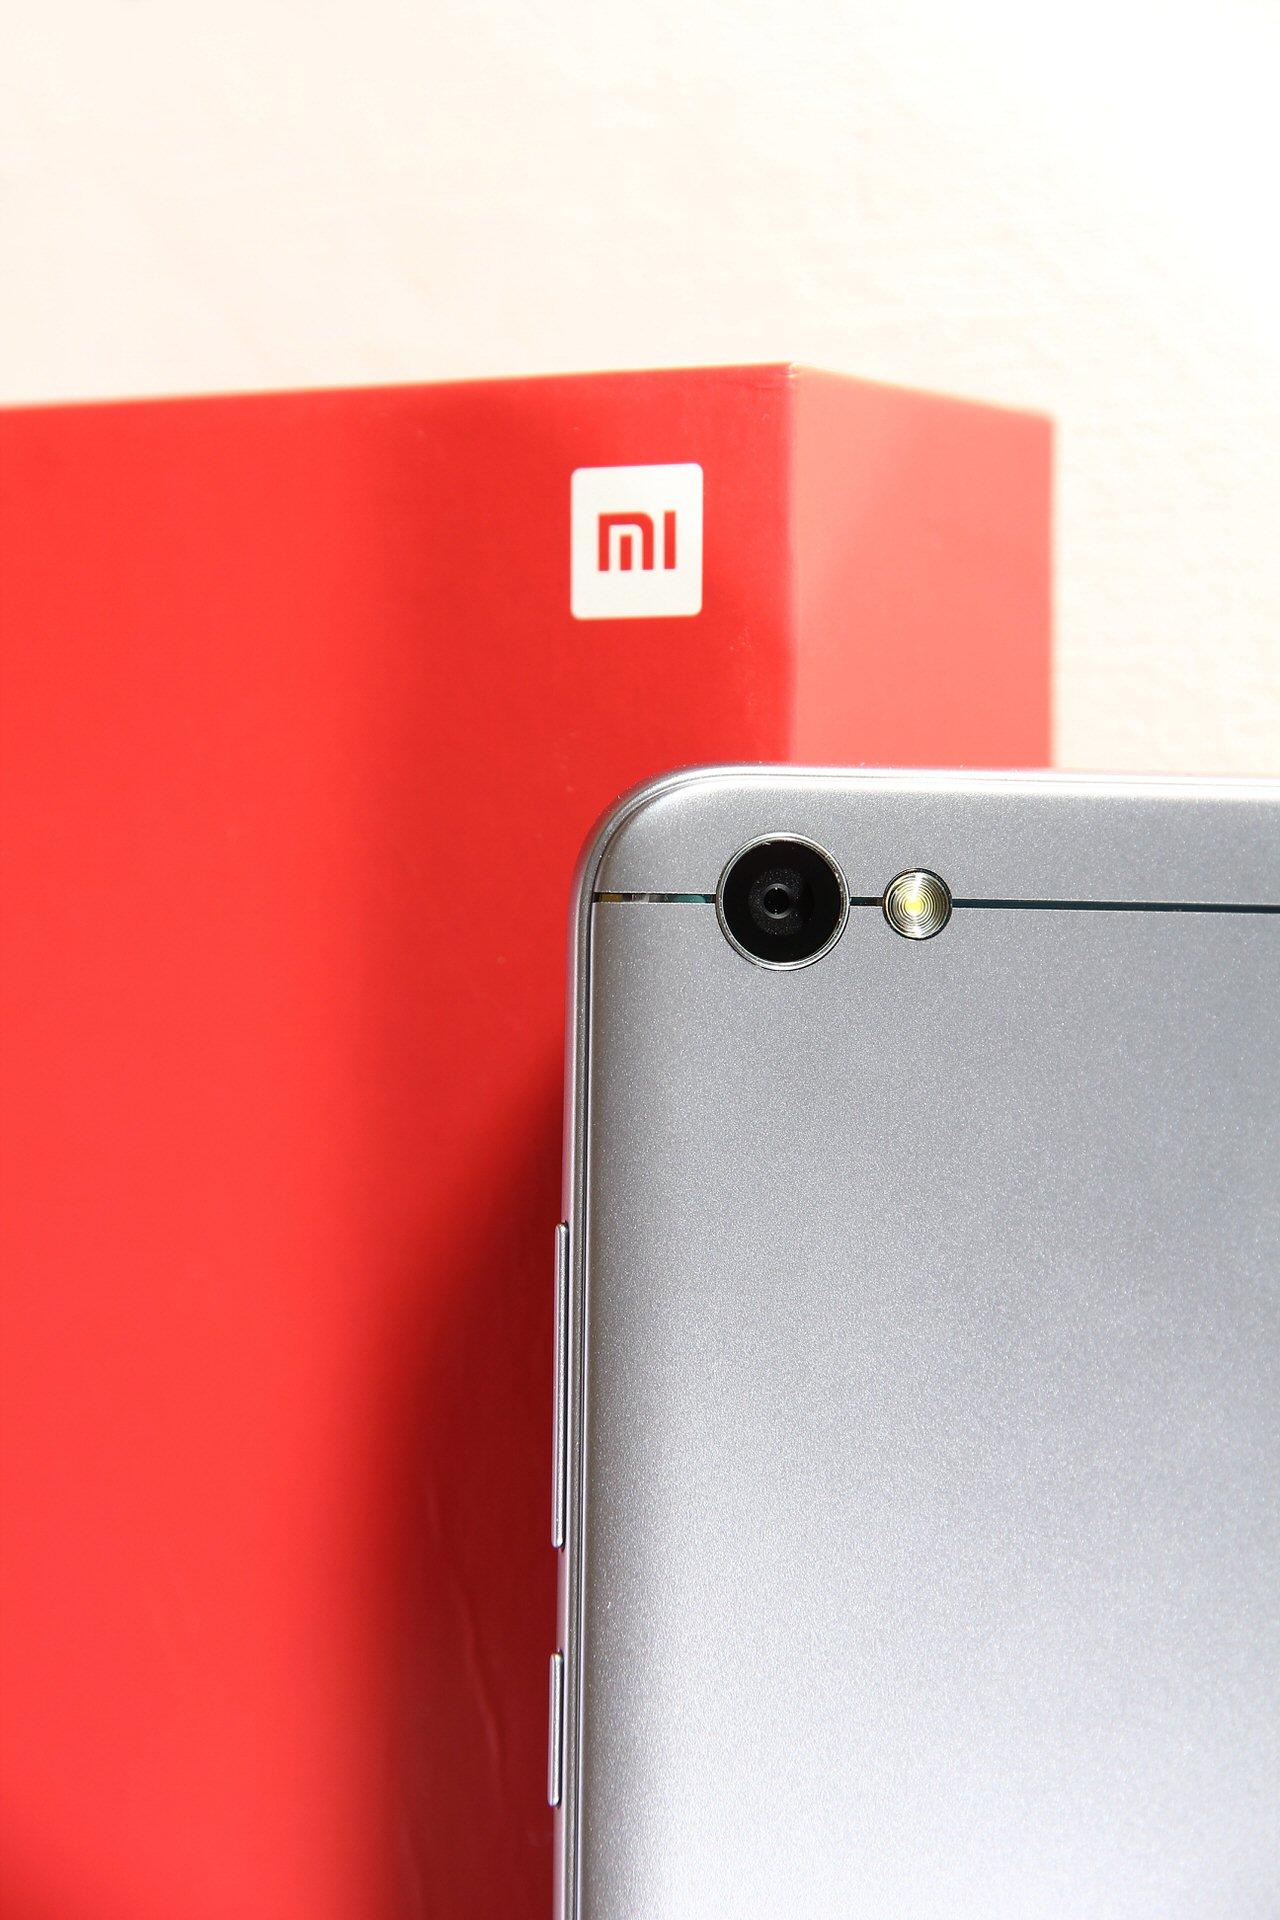 Test Xiaomi Redmi Note 5A : notre avis complet - Smartphones